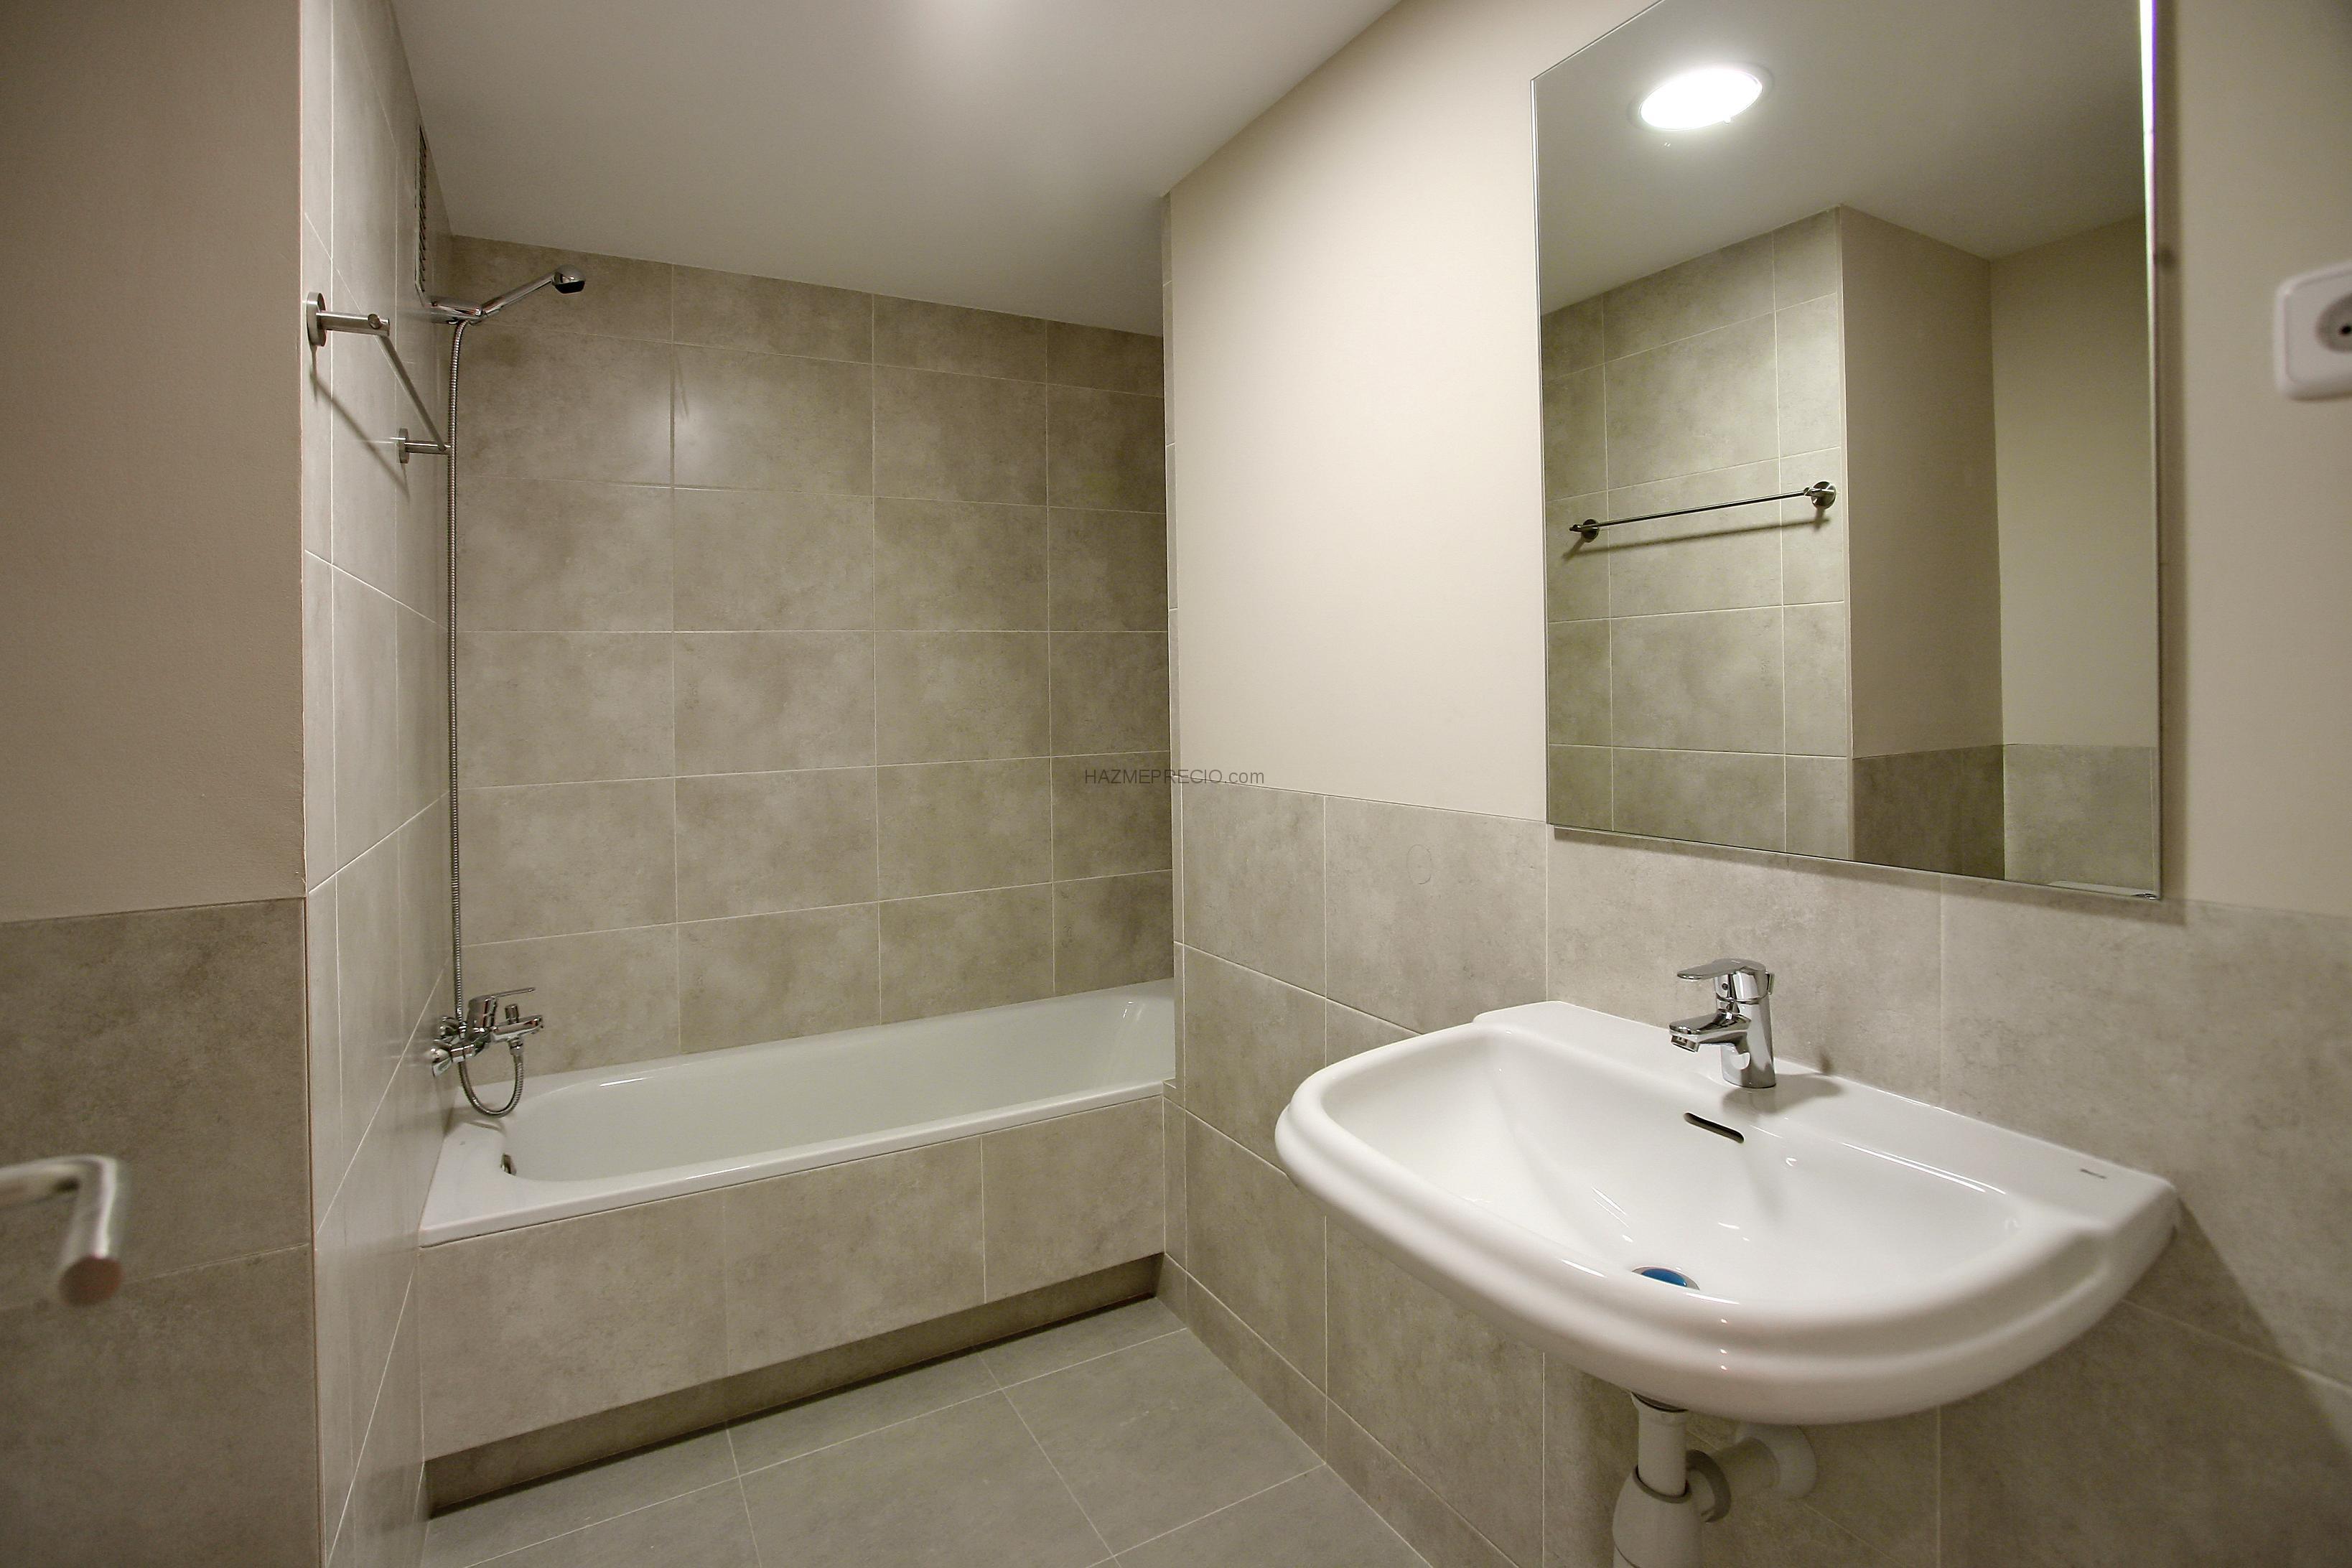 Rehabilitacion de viviendas barcelona - Alicatados de banos ...